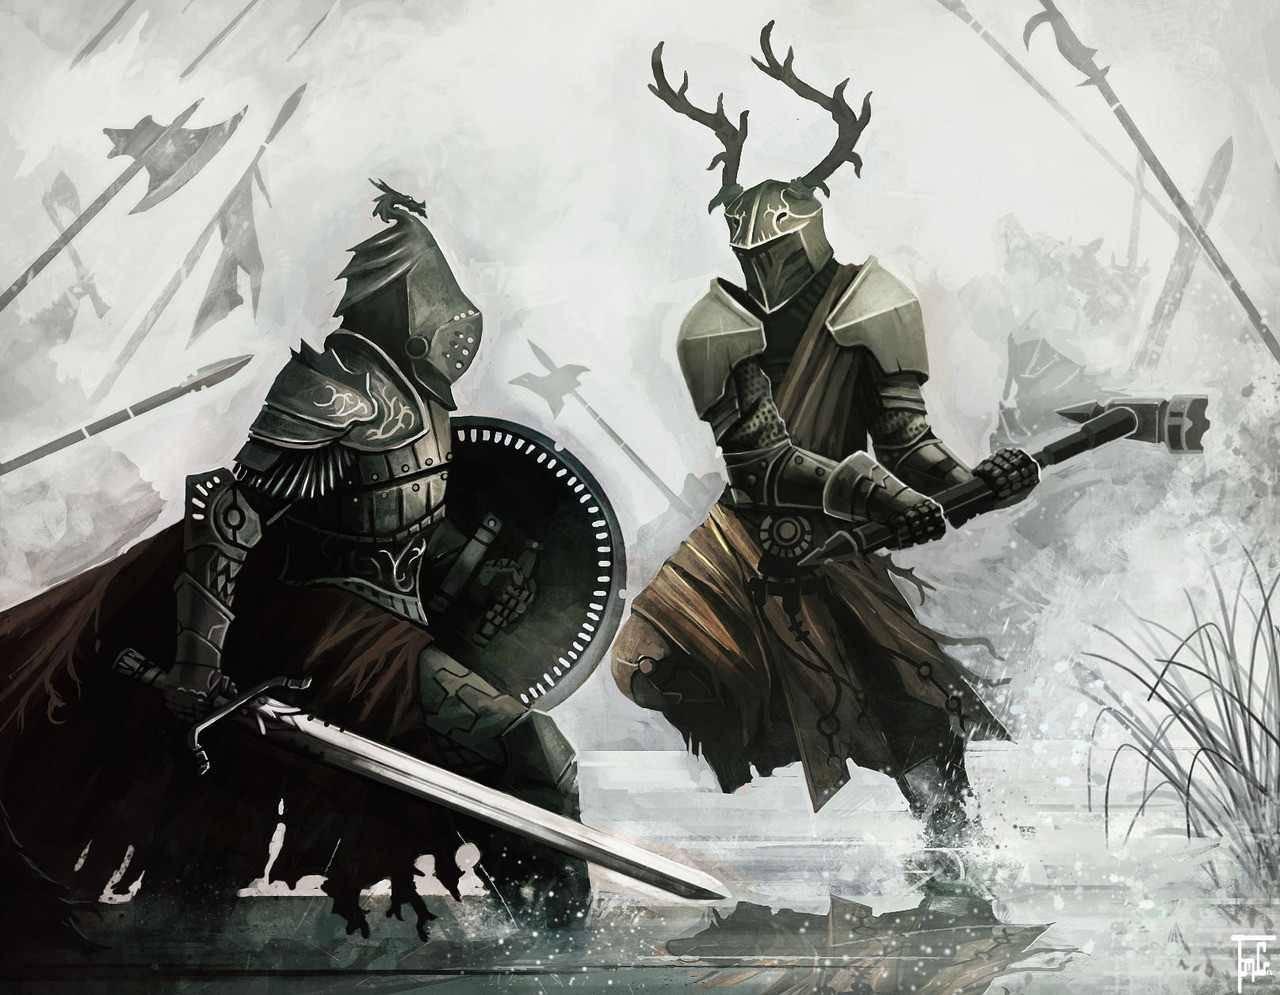 Novedades en A Clash of Kings Tumblr_mgjxi5ct3a1rfy3fko1_1280